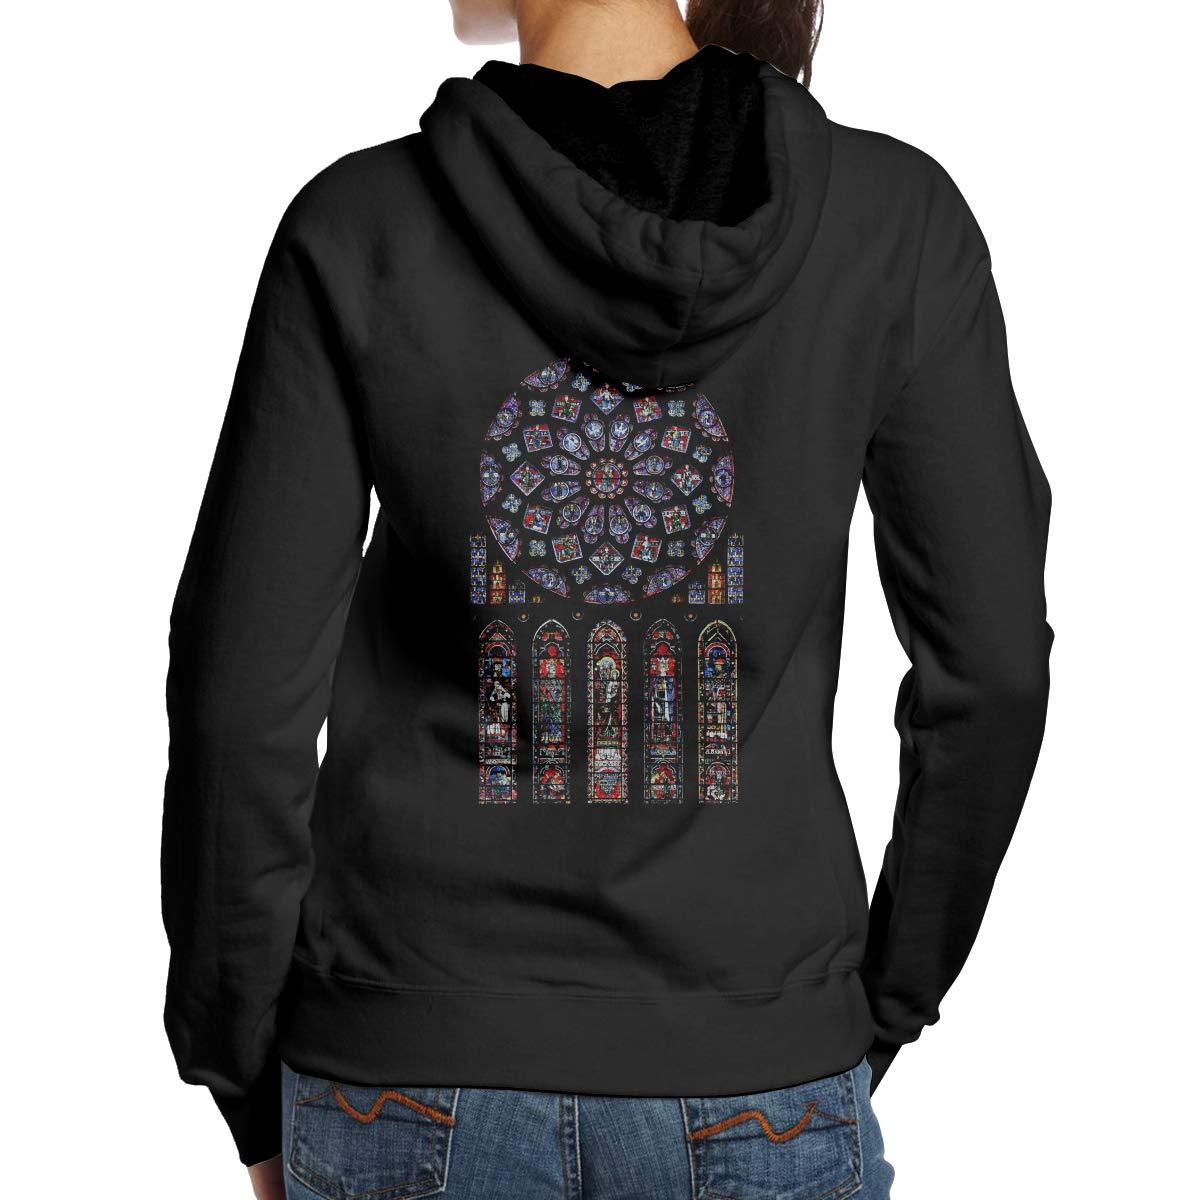 Notre Dame De Paris Printed Pullover Casual Hooded Coats 721 Shirts